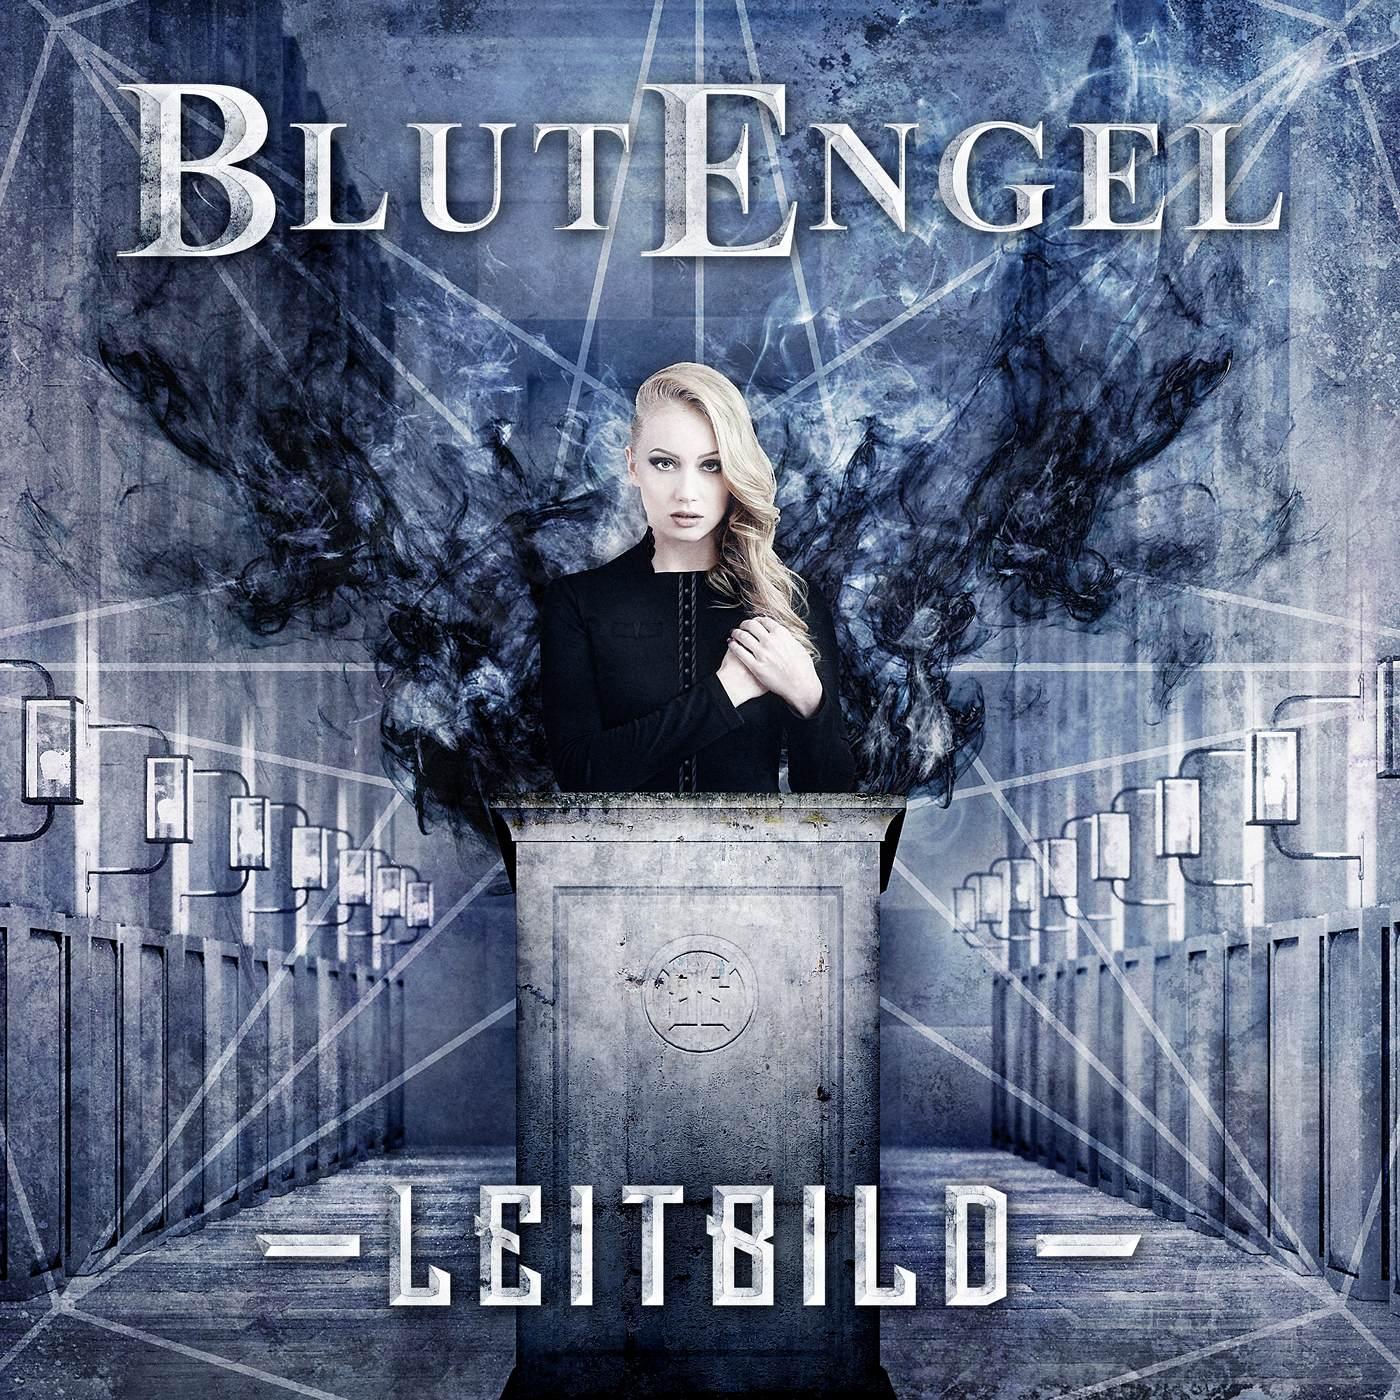 Blutengel: Leitbild (2017) Book Cover